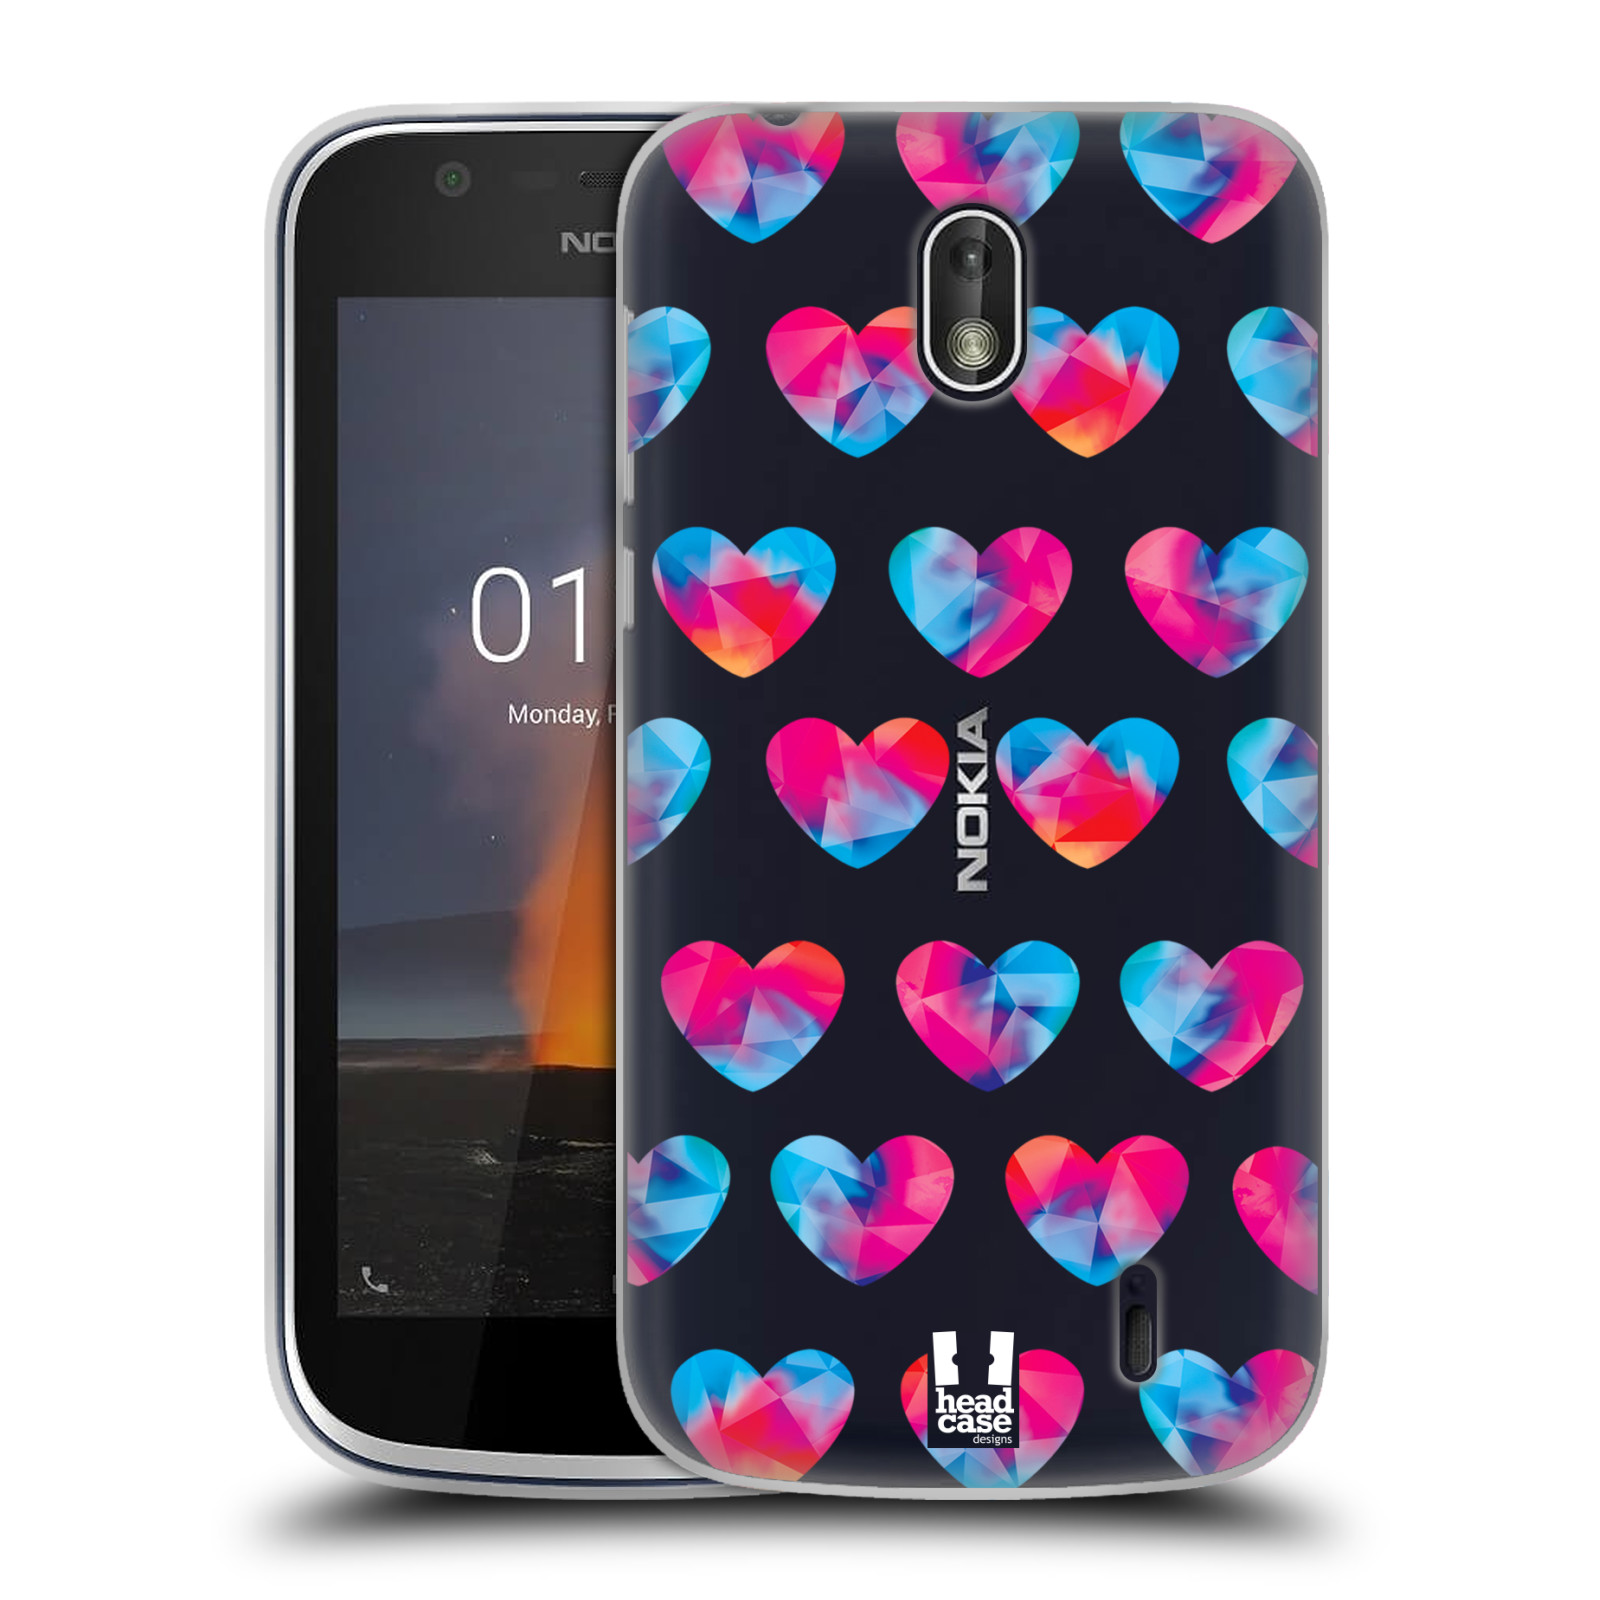 Silikonové pouzdro na mobil Nokia 1 - Head Case - Srdíčka hrající barvami